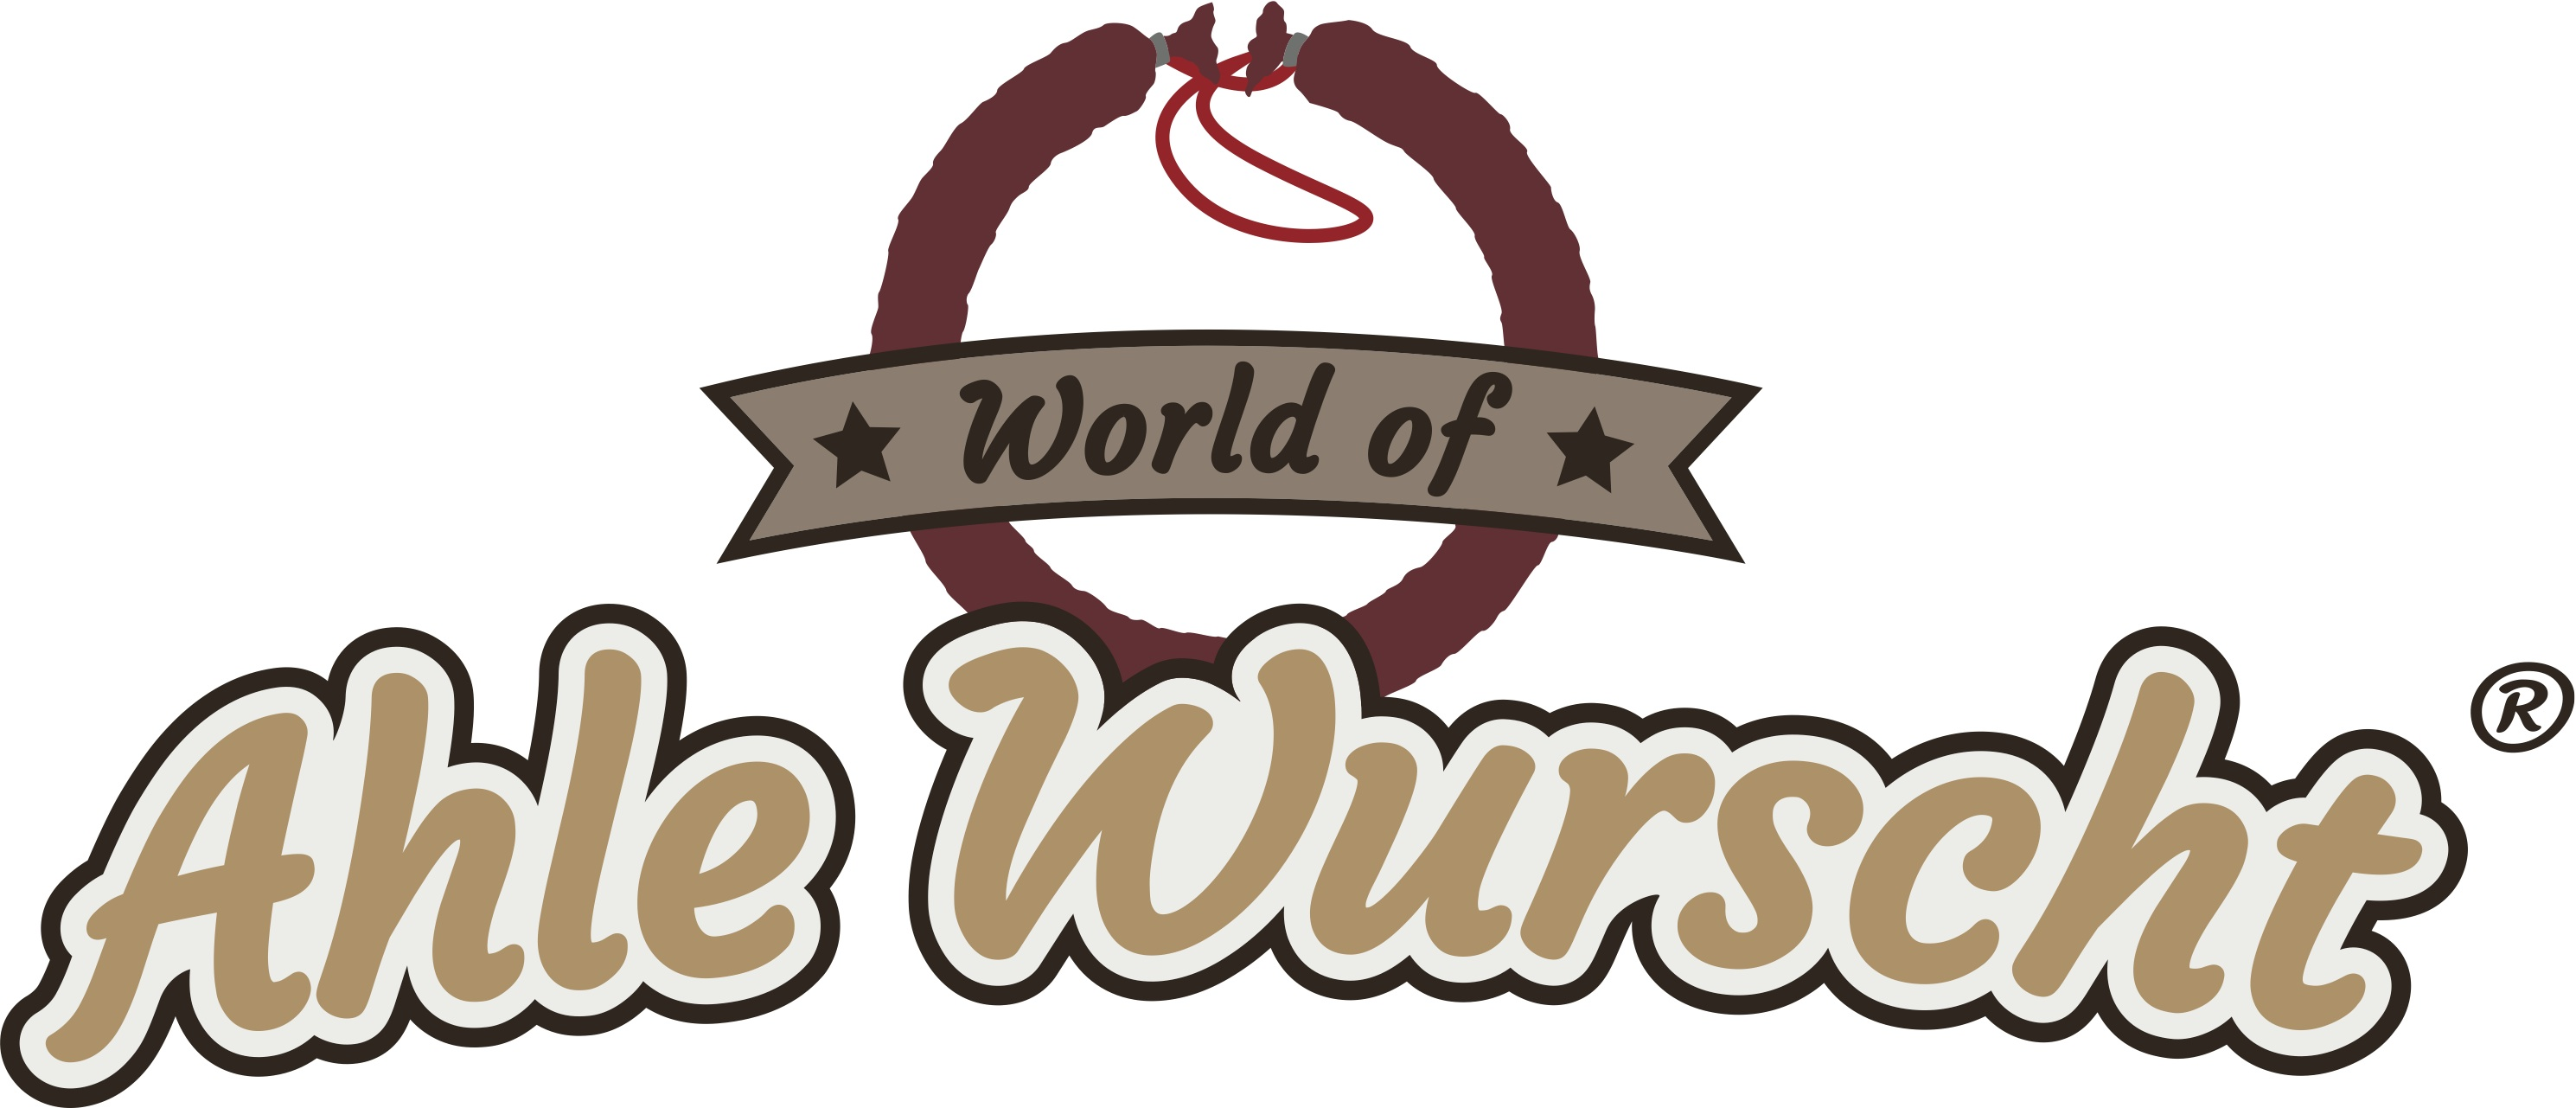 World of Ahle Wurscht